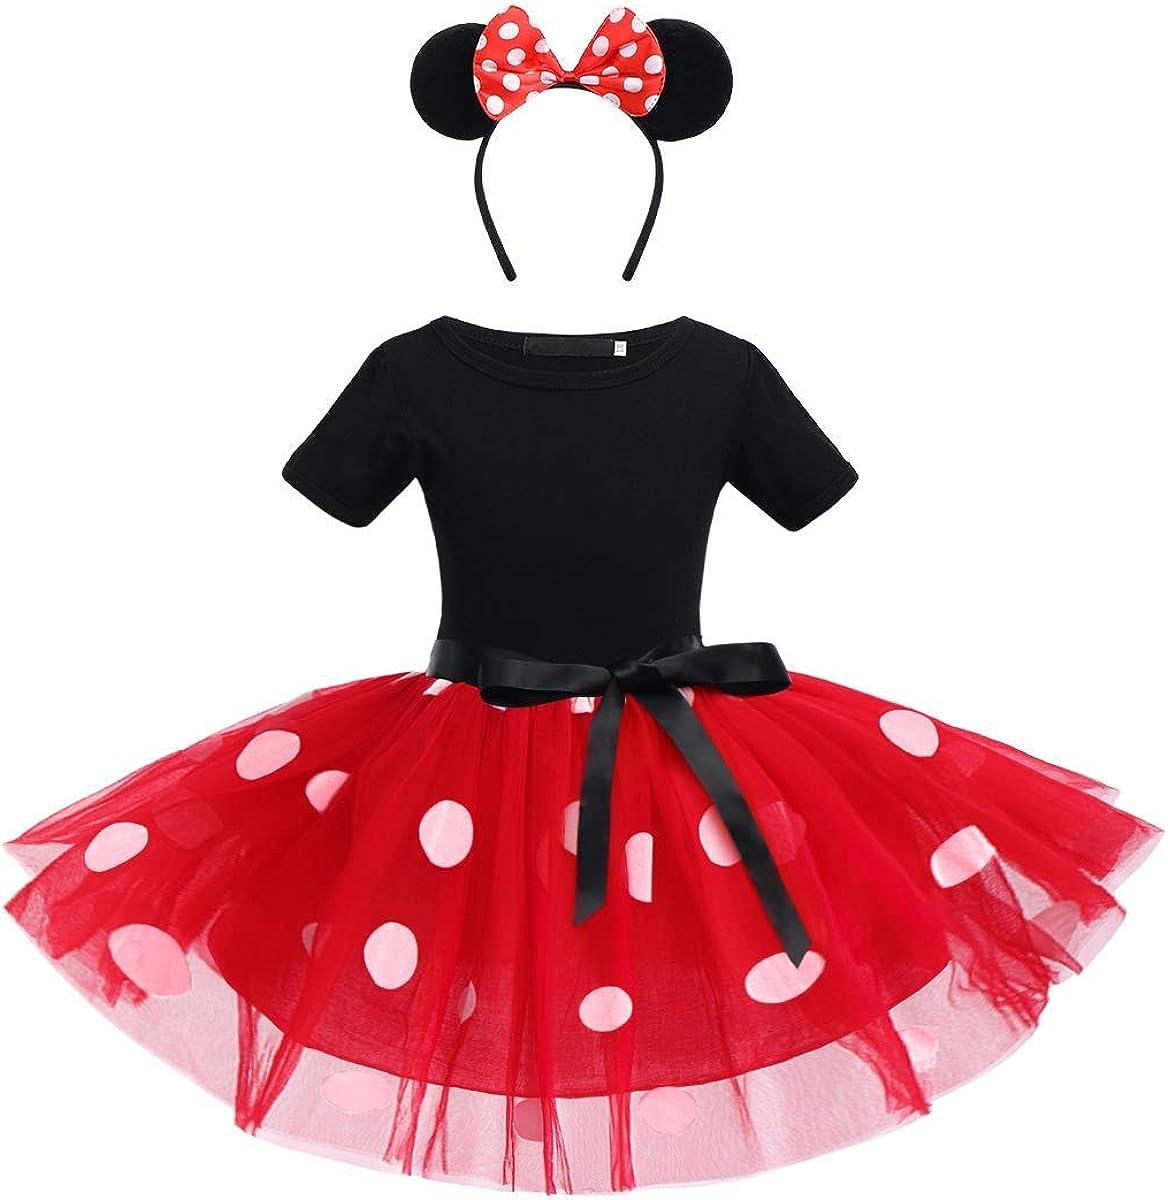 Mouse Costume Baby Toddler Girl Tutu Dress Princess Dress Up Birthday Halloween